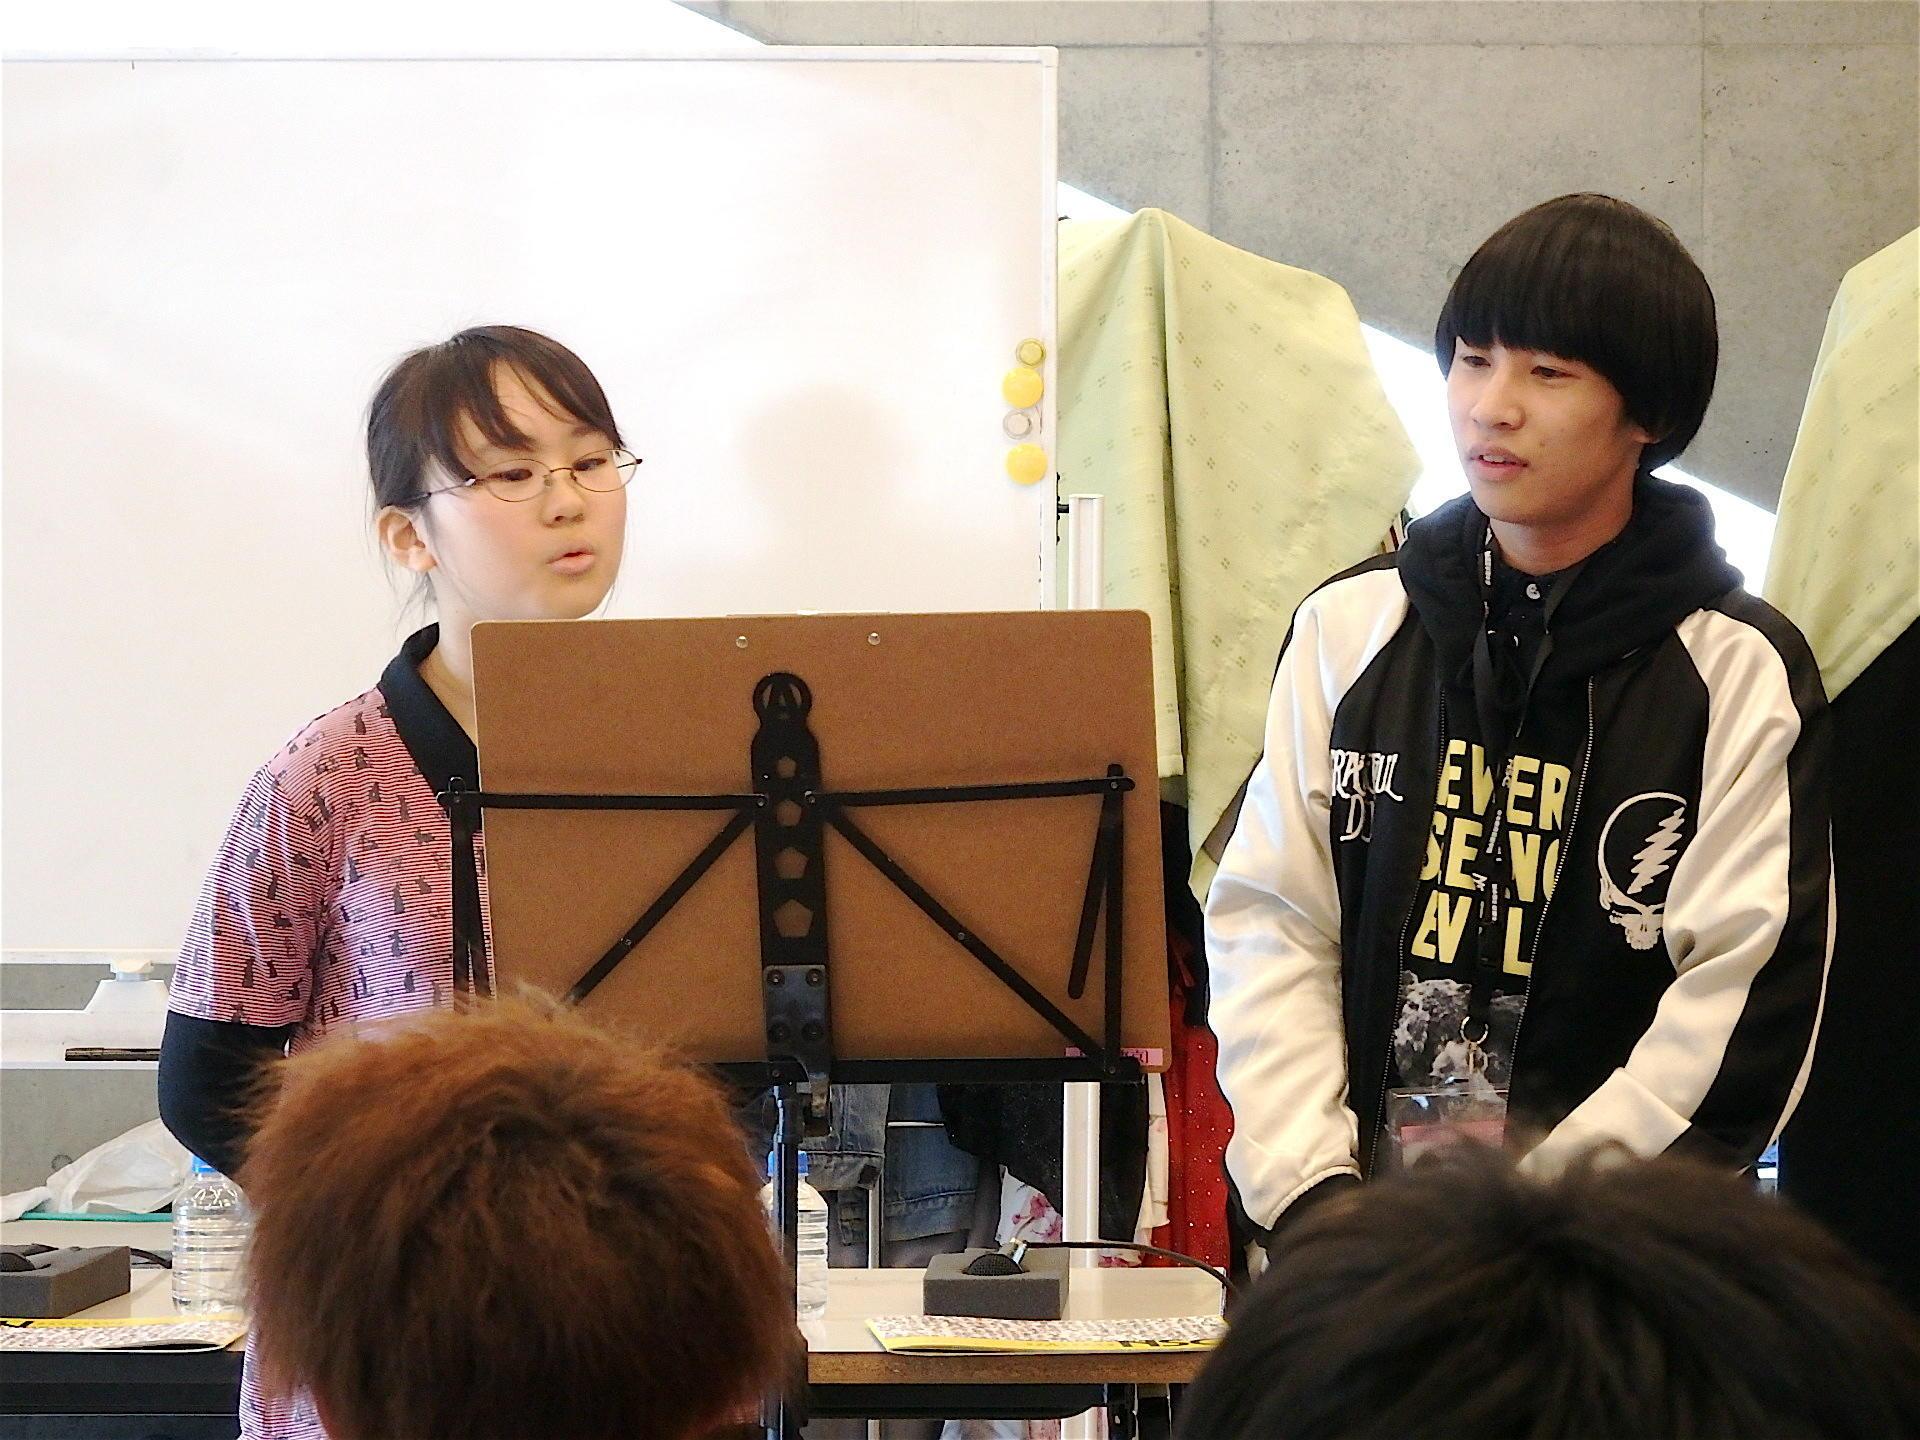 http://news.yoshimoto.co.jp/20160501000251-c9730a48a18e18dc8a08eef4ac1eae444d699c19.jpg